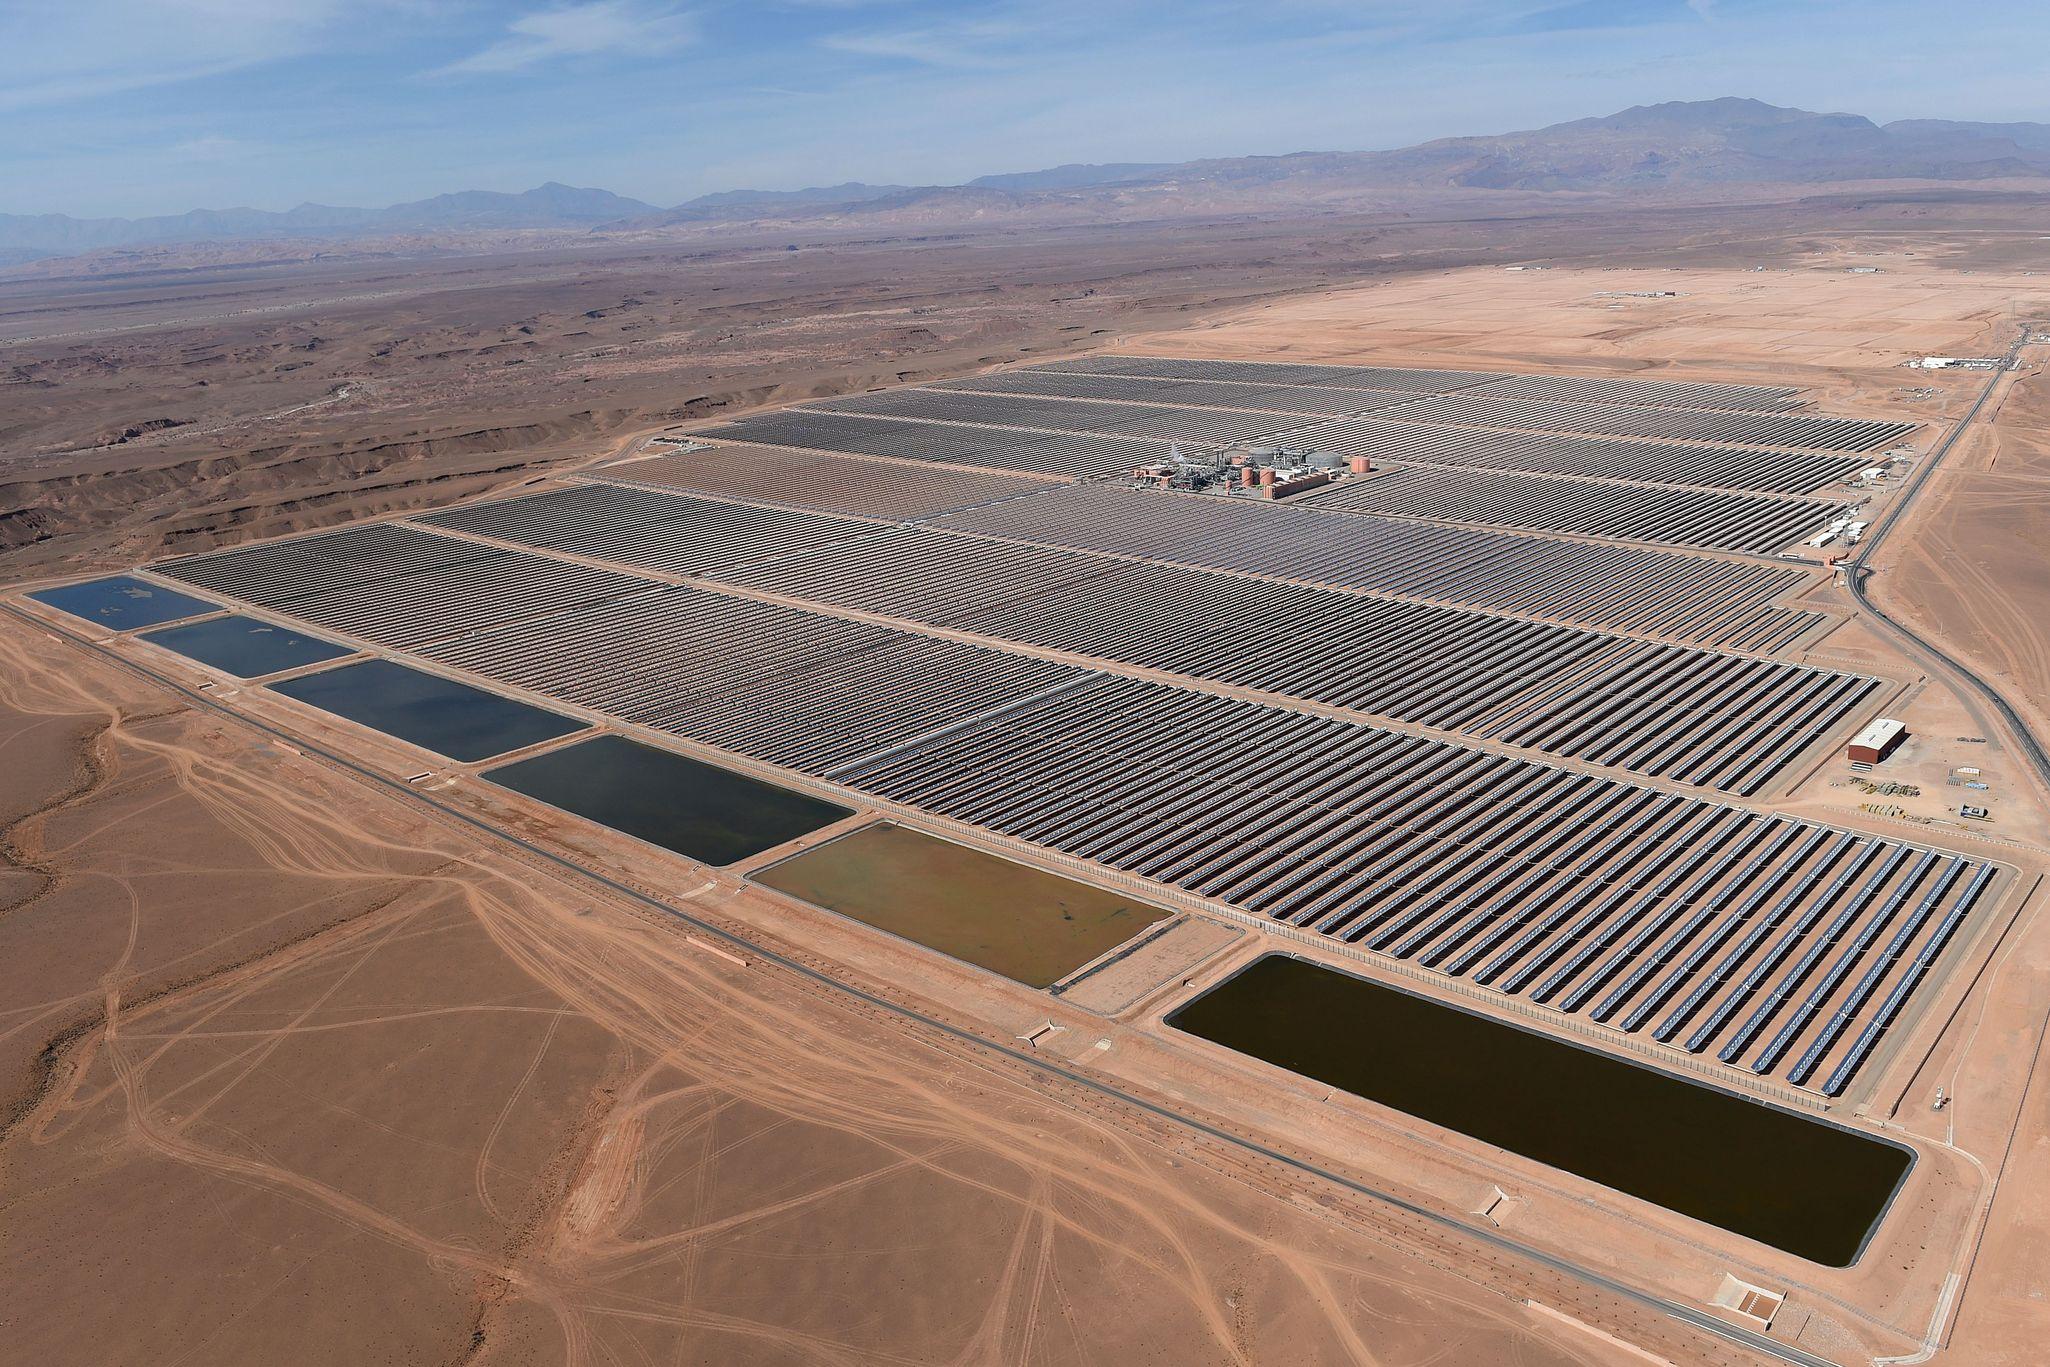 Qatar to build major solar project